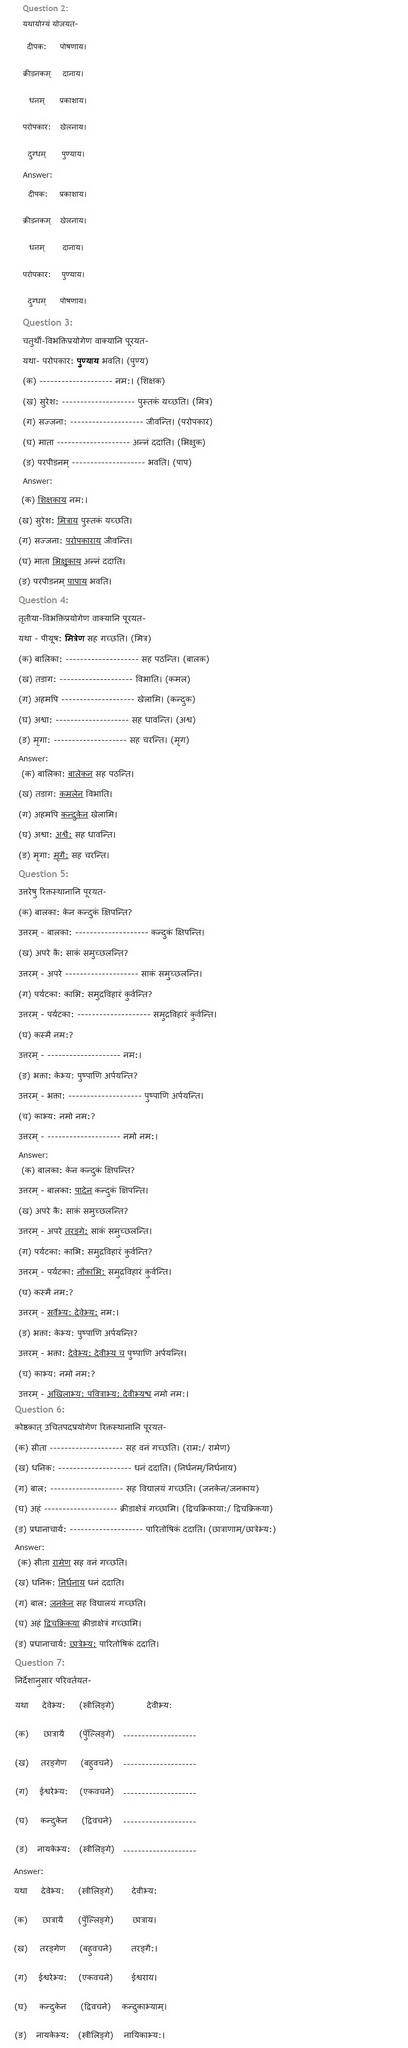 NCERT Solutions Class 6 Sanskrit Chapter 7 समुद्रतट तृतीया चतुर्थी विभक्ति